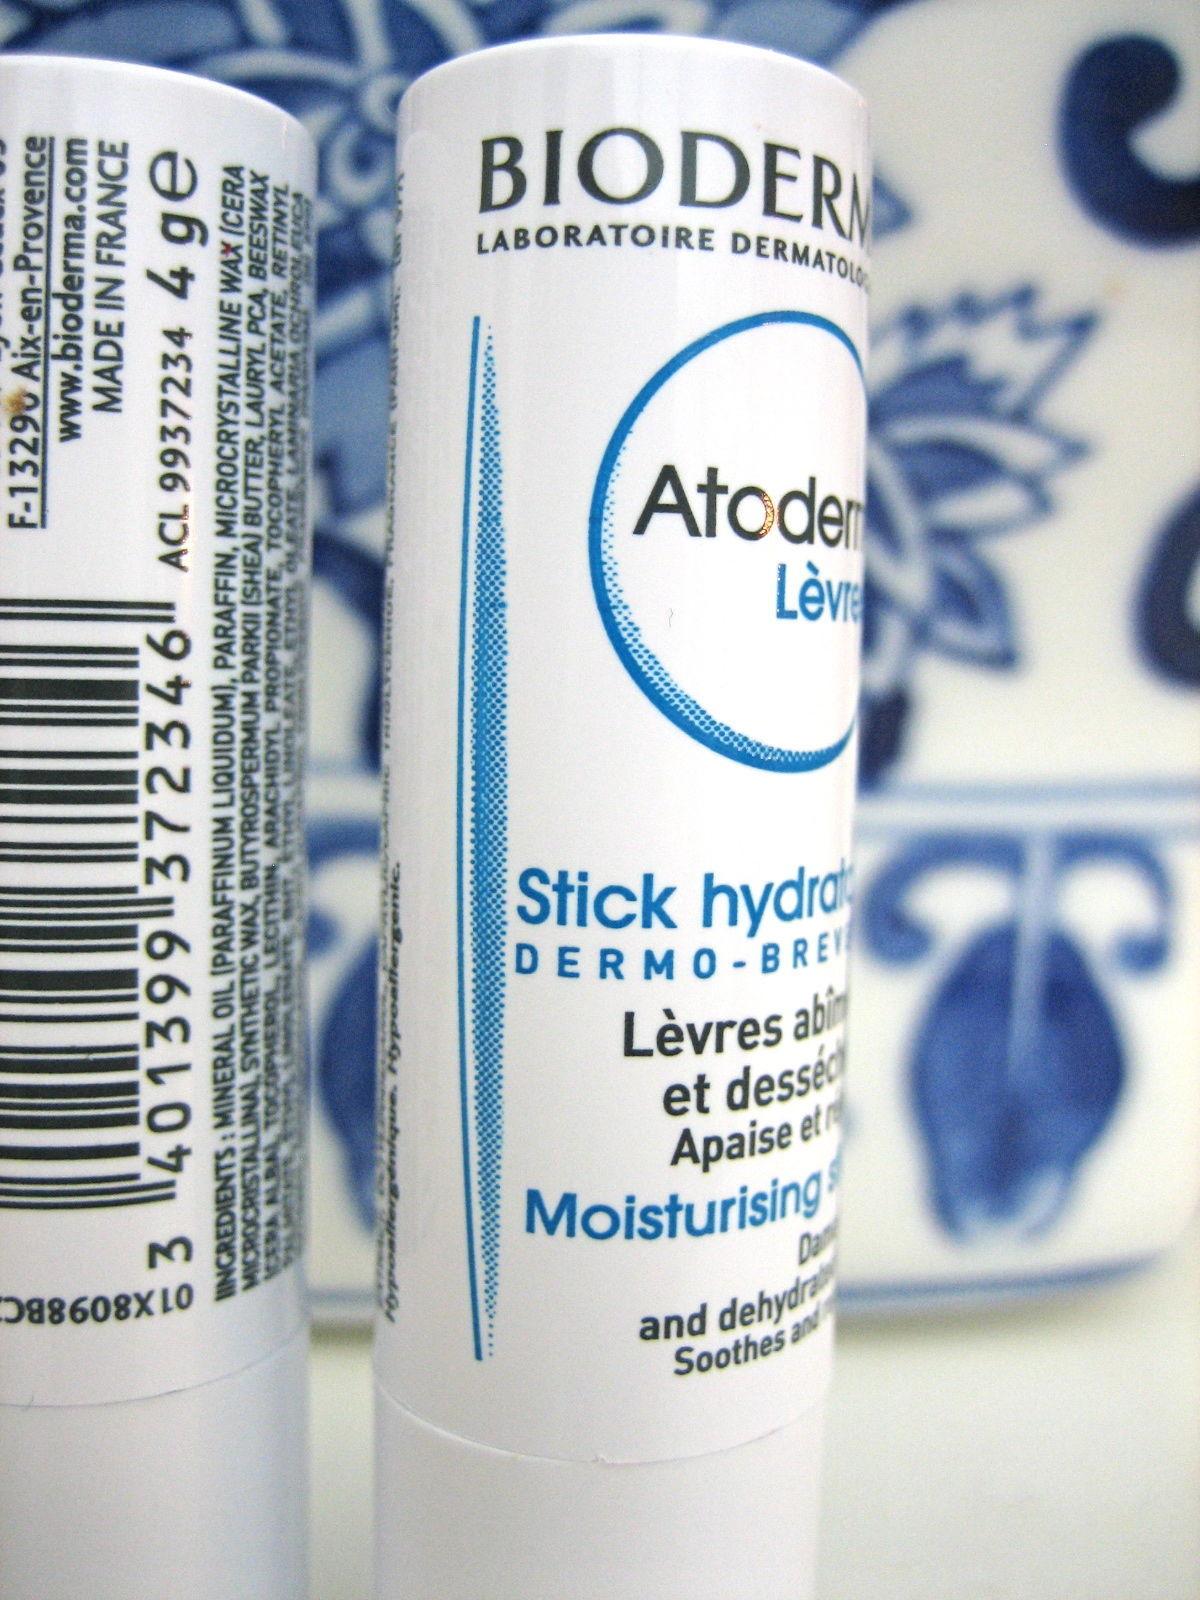 2 Bioderma Atoderm Moisturizing Lip Stick Balm from France